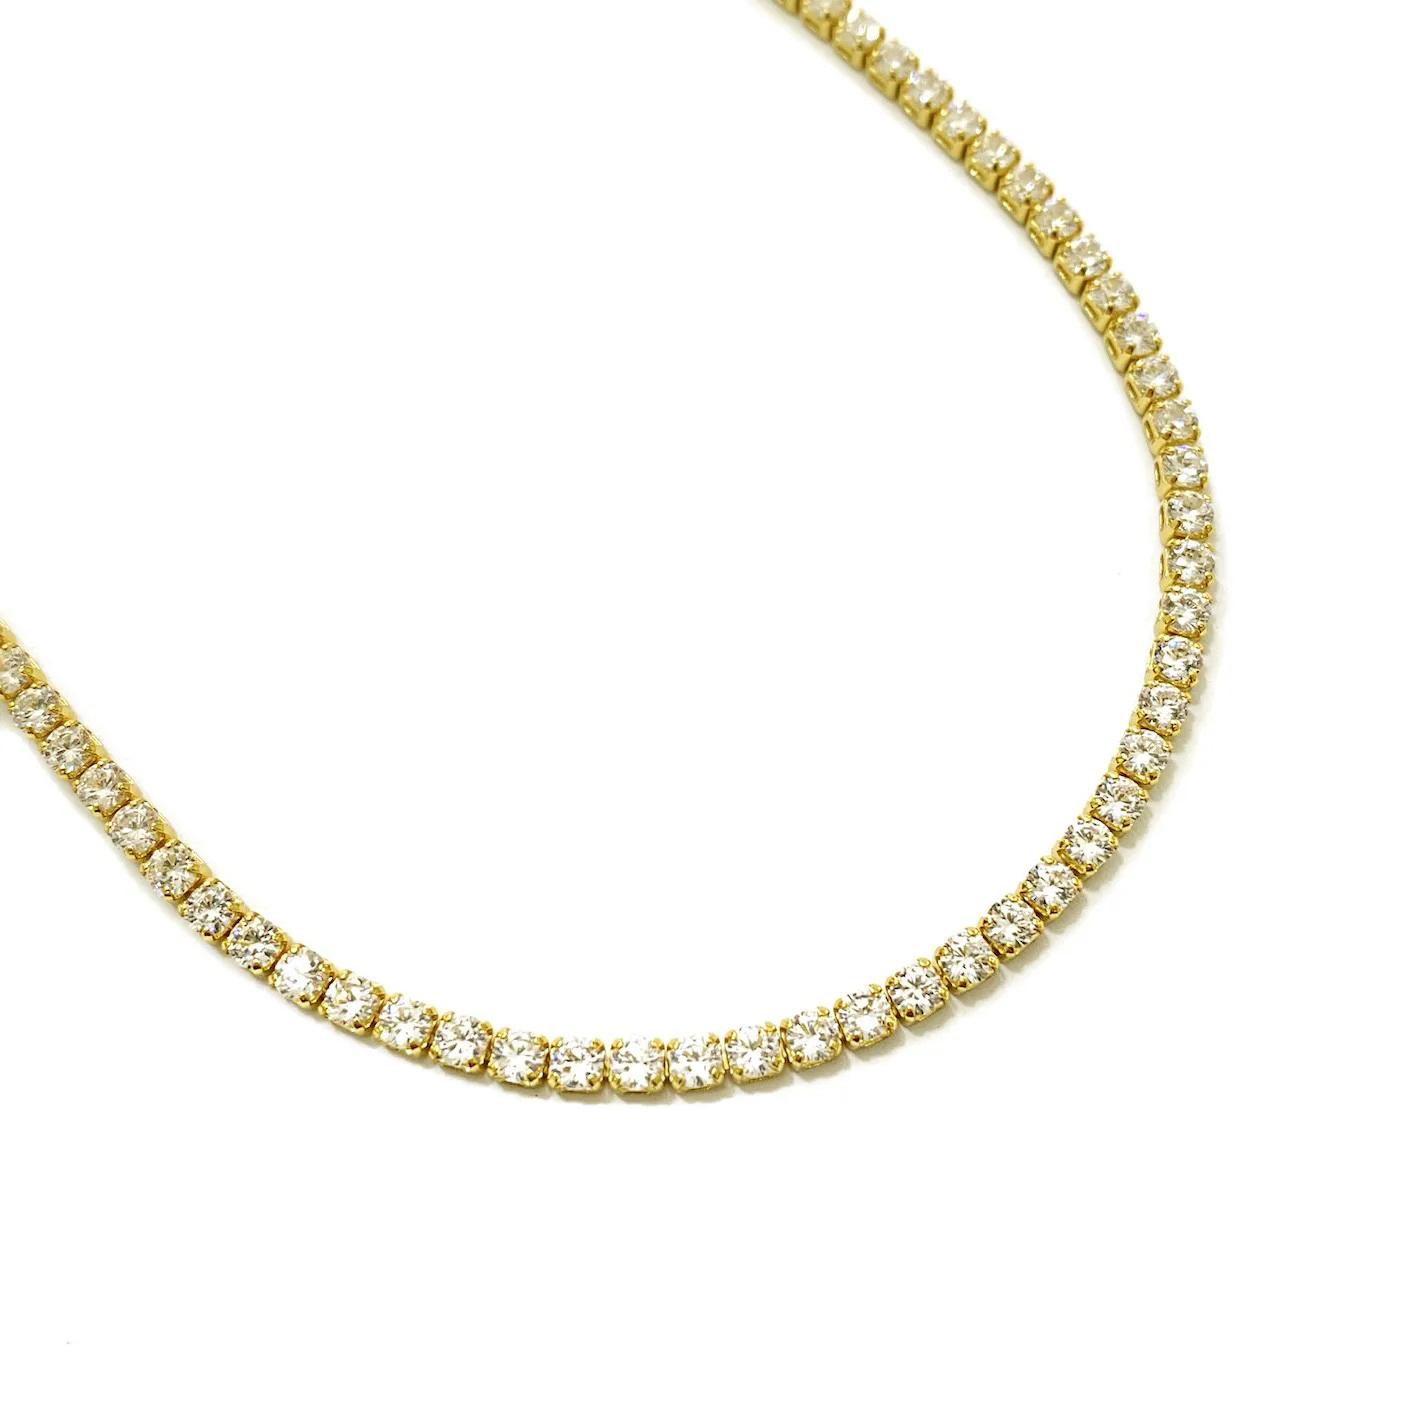 Corrente Riviera Tennis Chain 3mm 45cm13g (Pedra Zircônia) (Banho Ouro 24k)